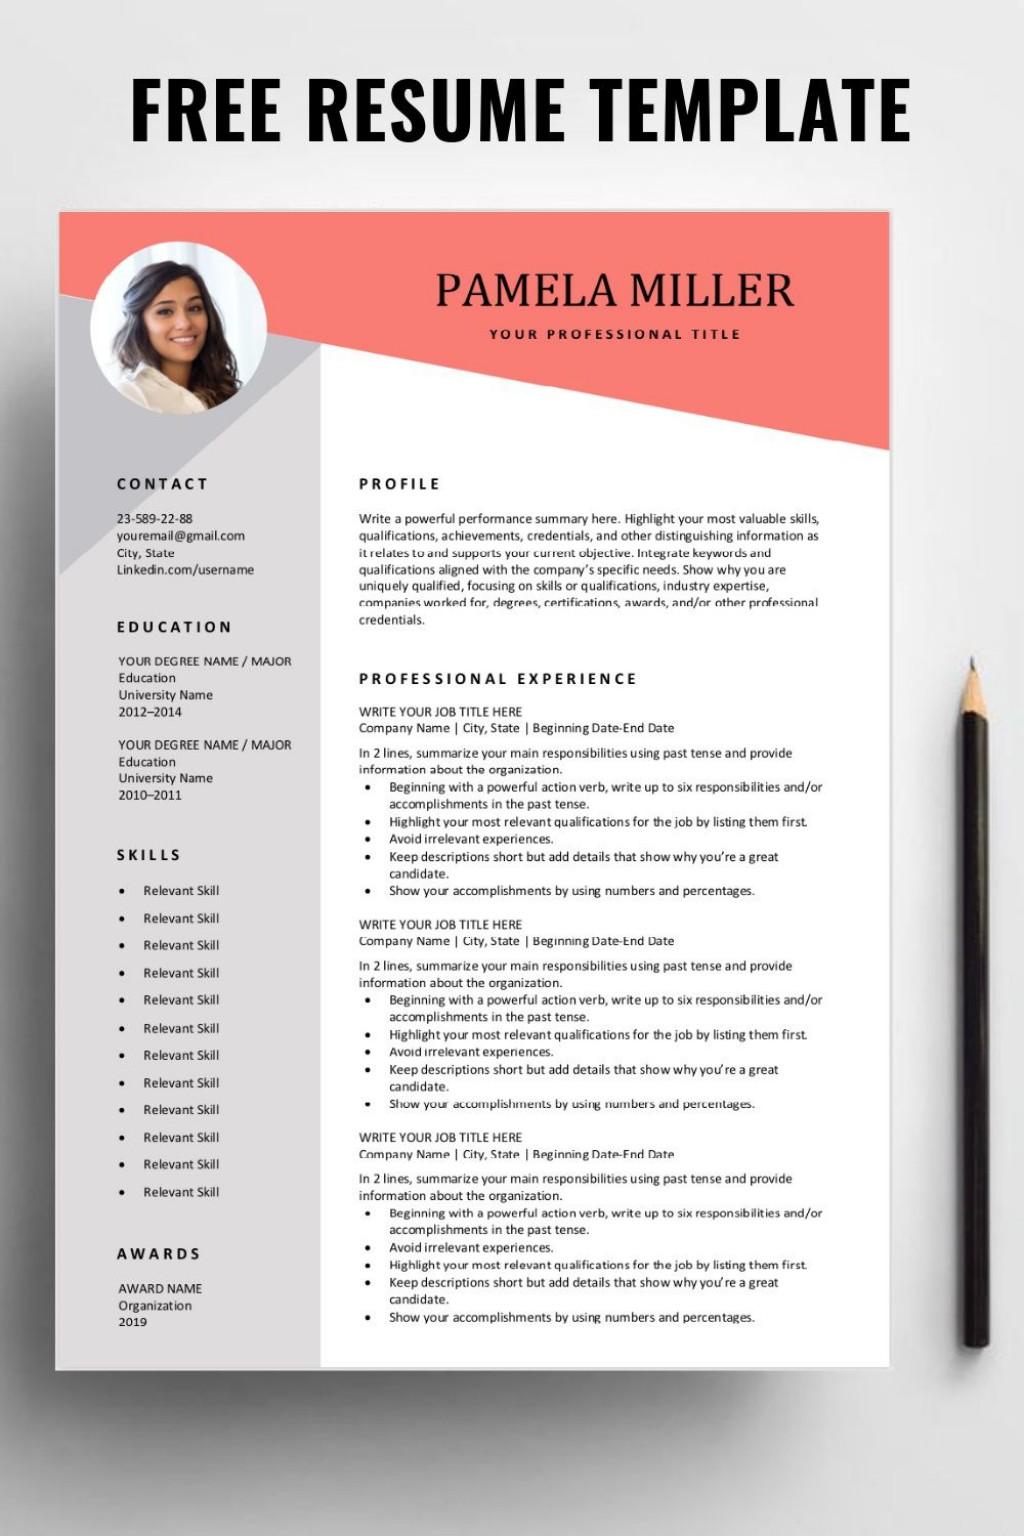 001 Surprising Free Download Resume Template Idea  Templates Word 2019 Pdf 2020Large